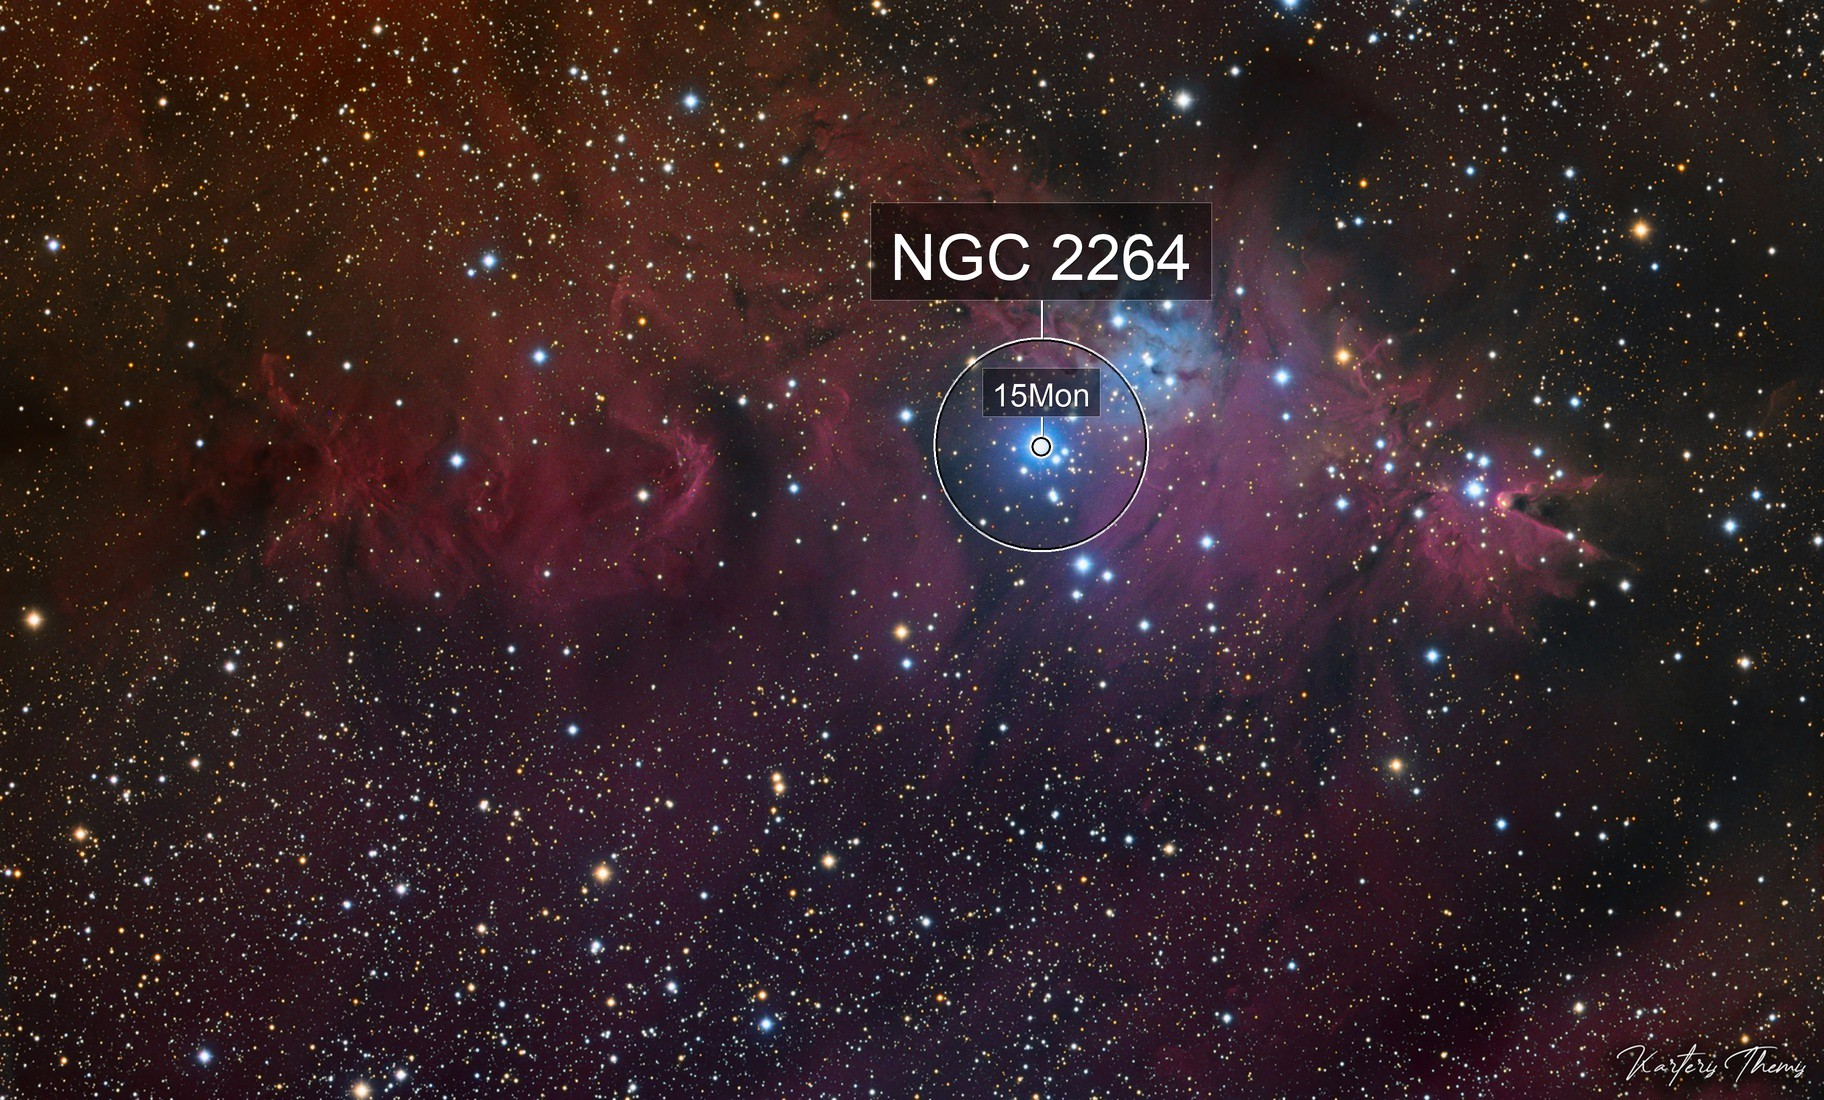 Ngc2264 Cone & Christmas & Fox Fur Nebulas Halrgb